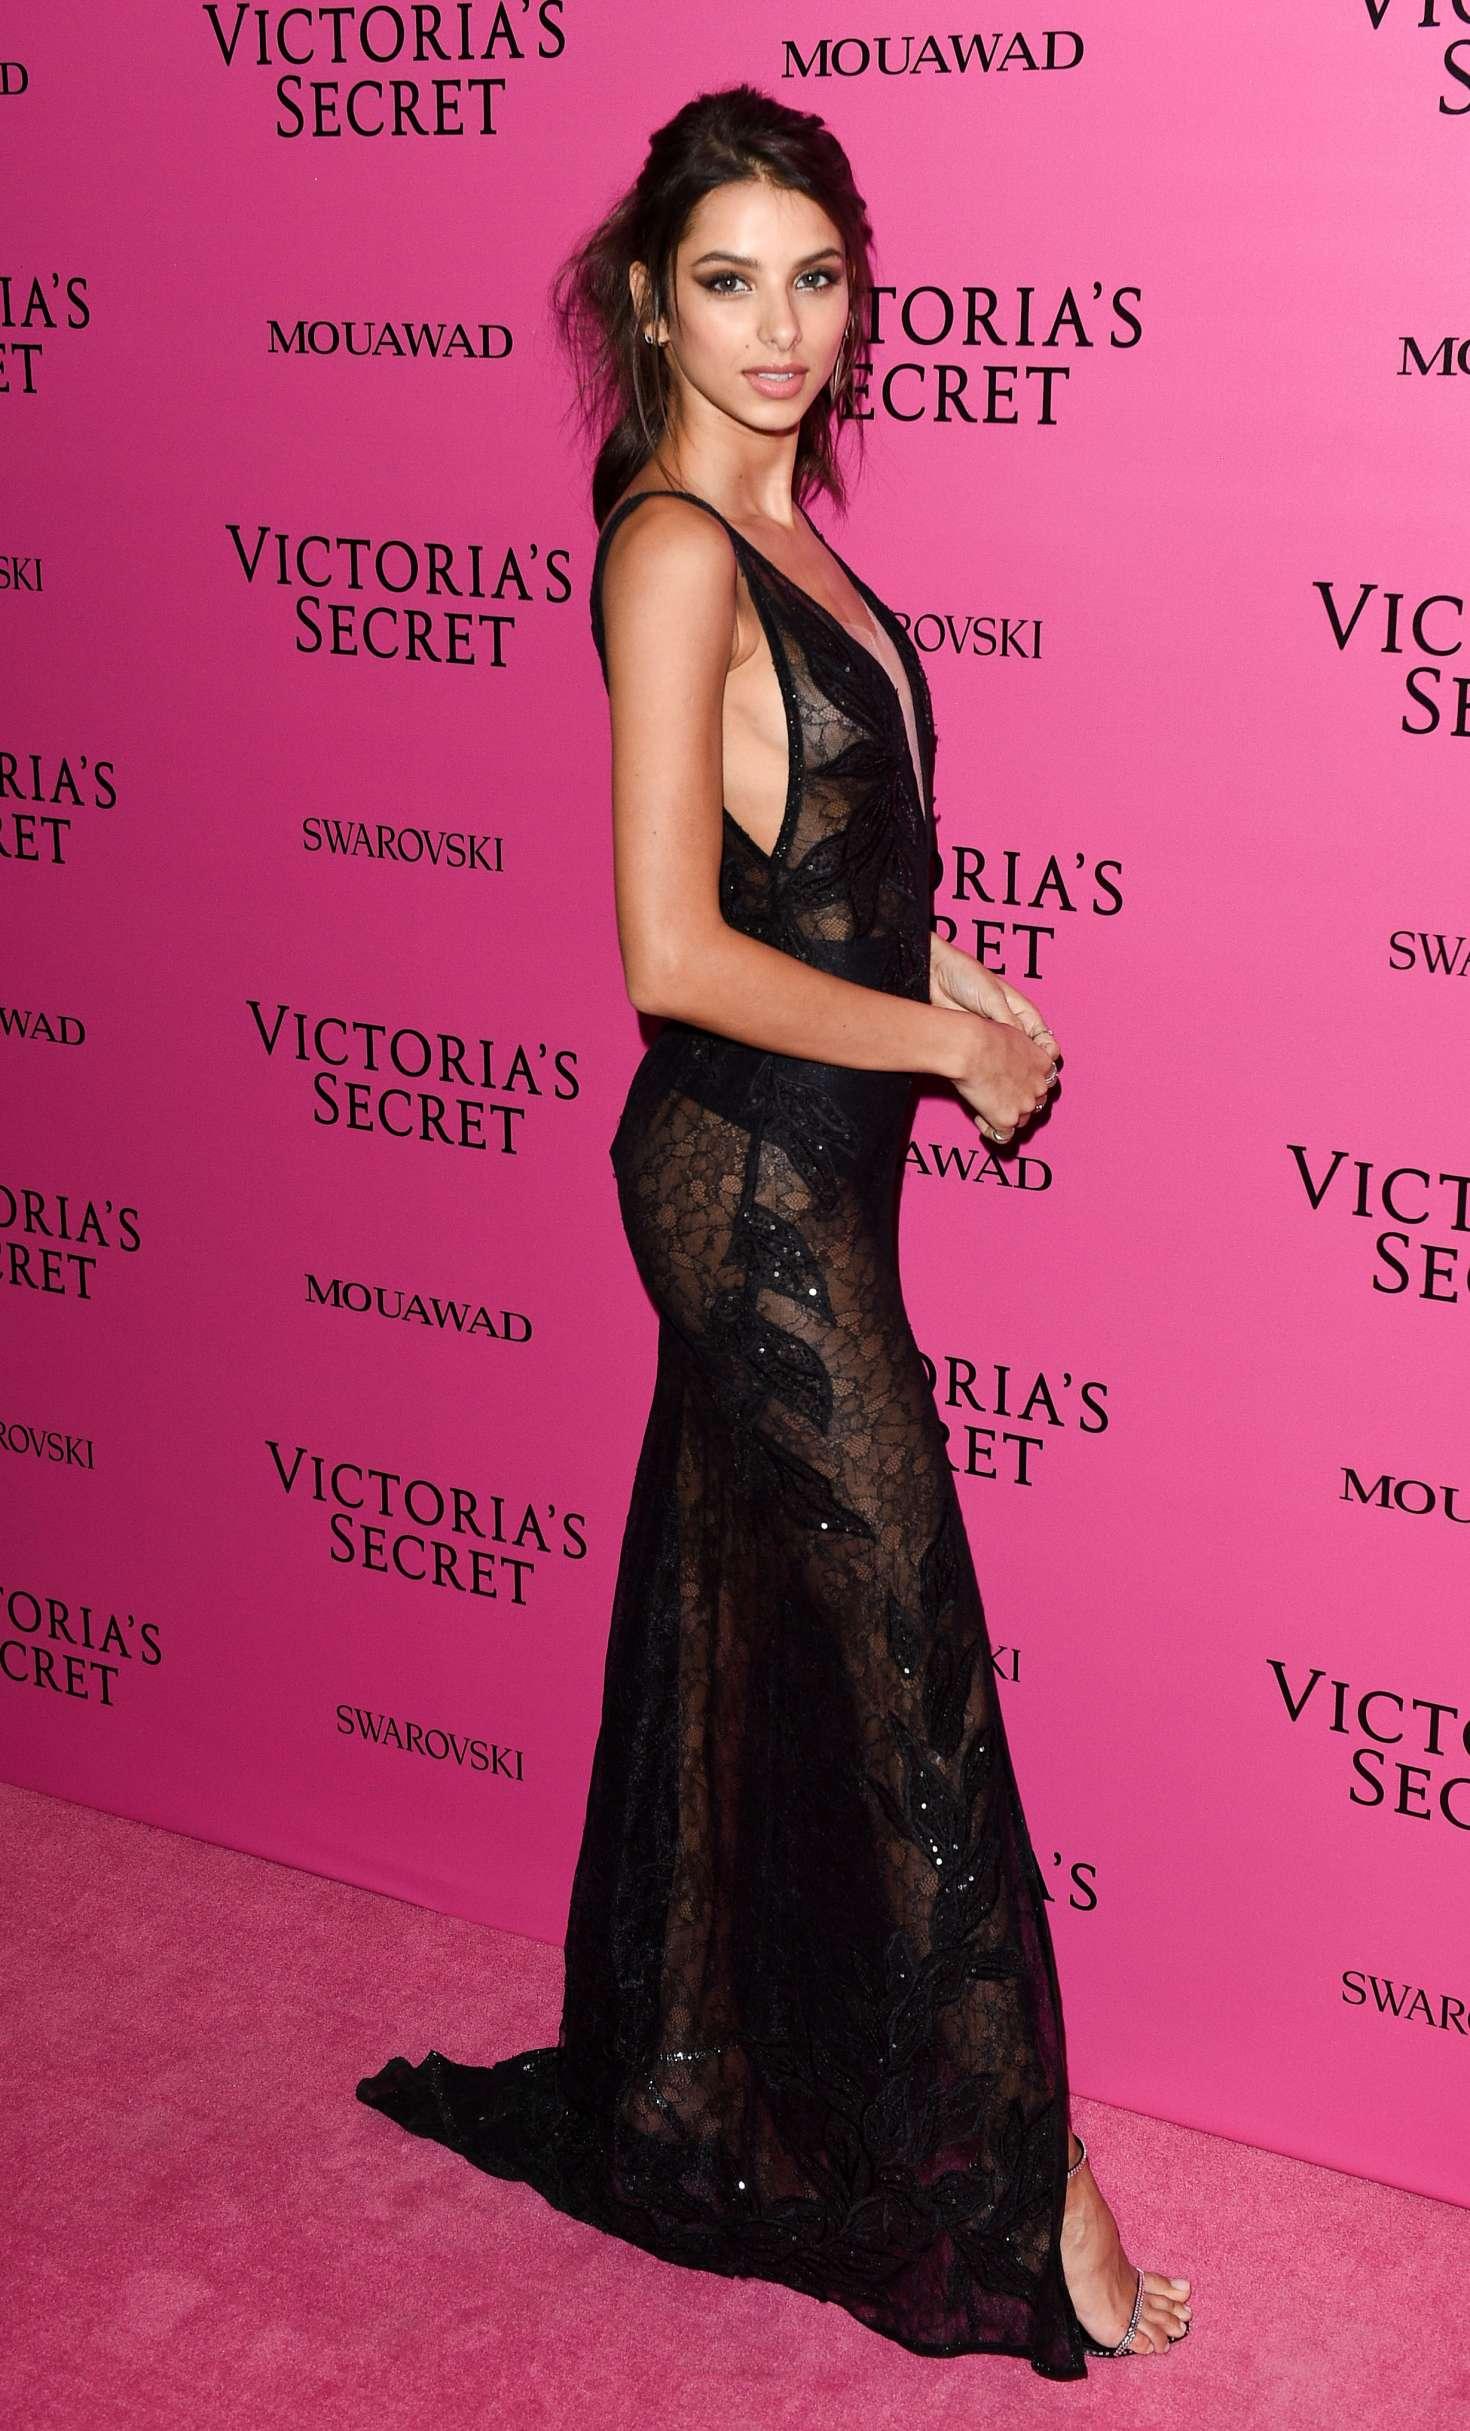 Bruna Lirio Photostream | Fashion, Victoria secret fashion